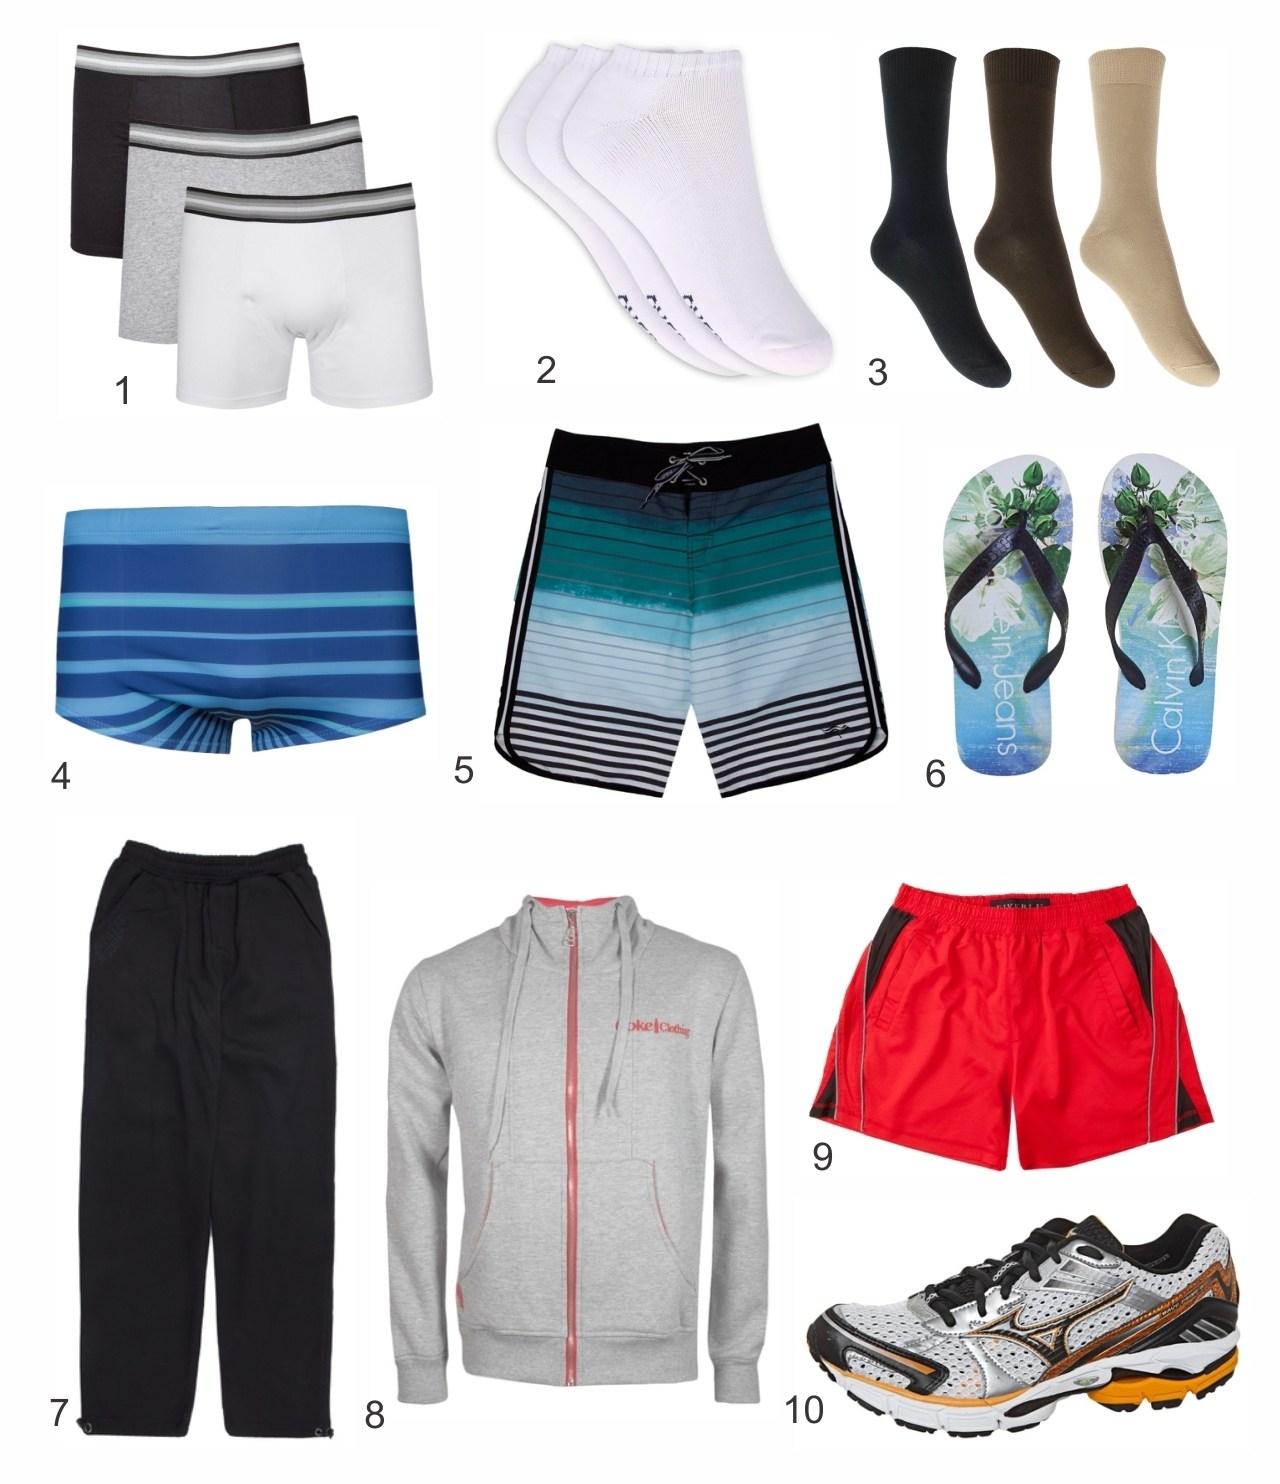 guarda_roupa_underwear_beachwear_esportivo_pra_vestir